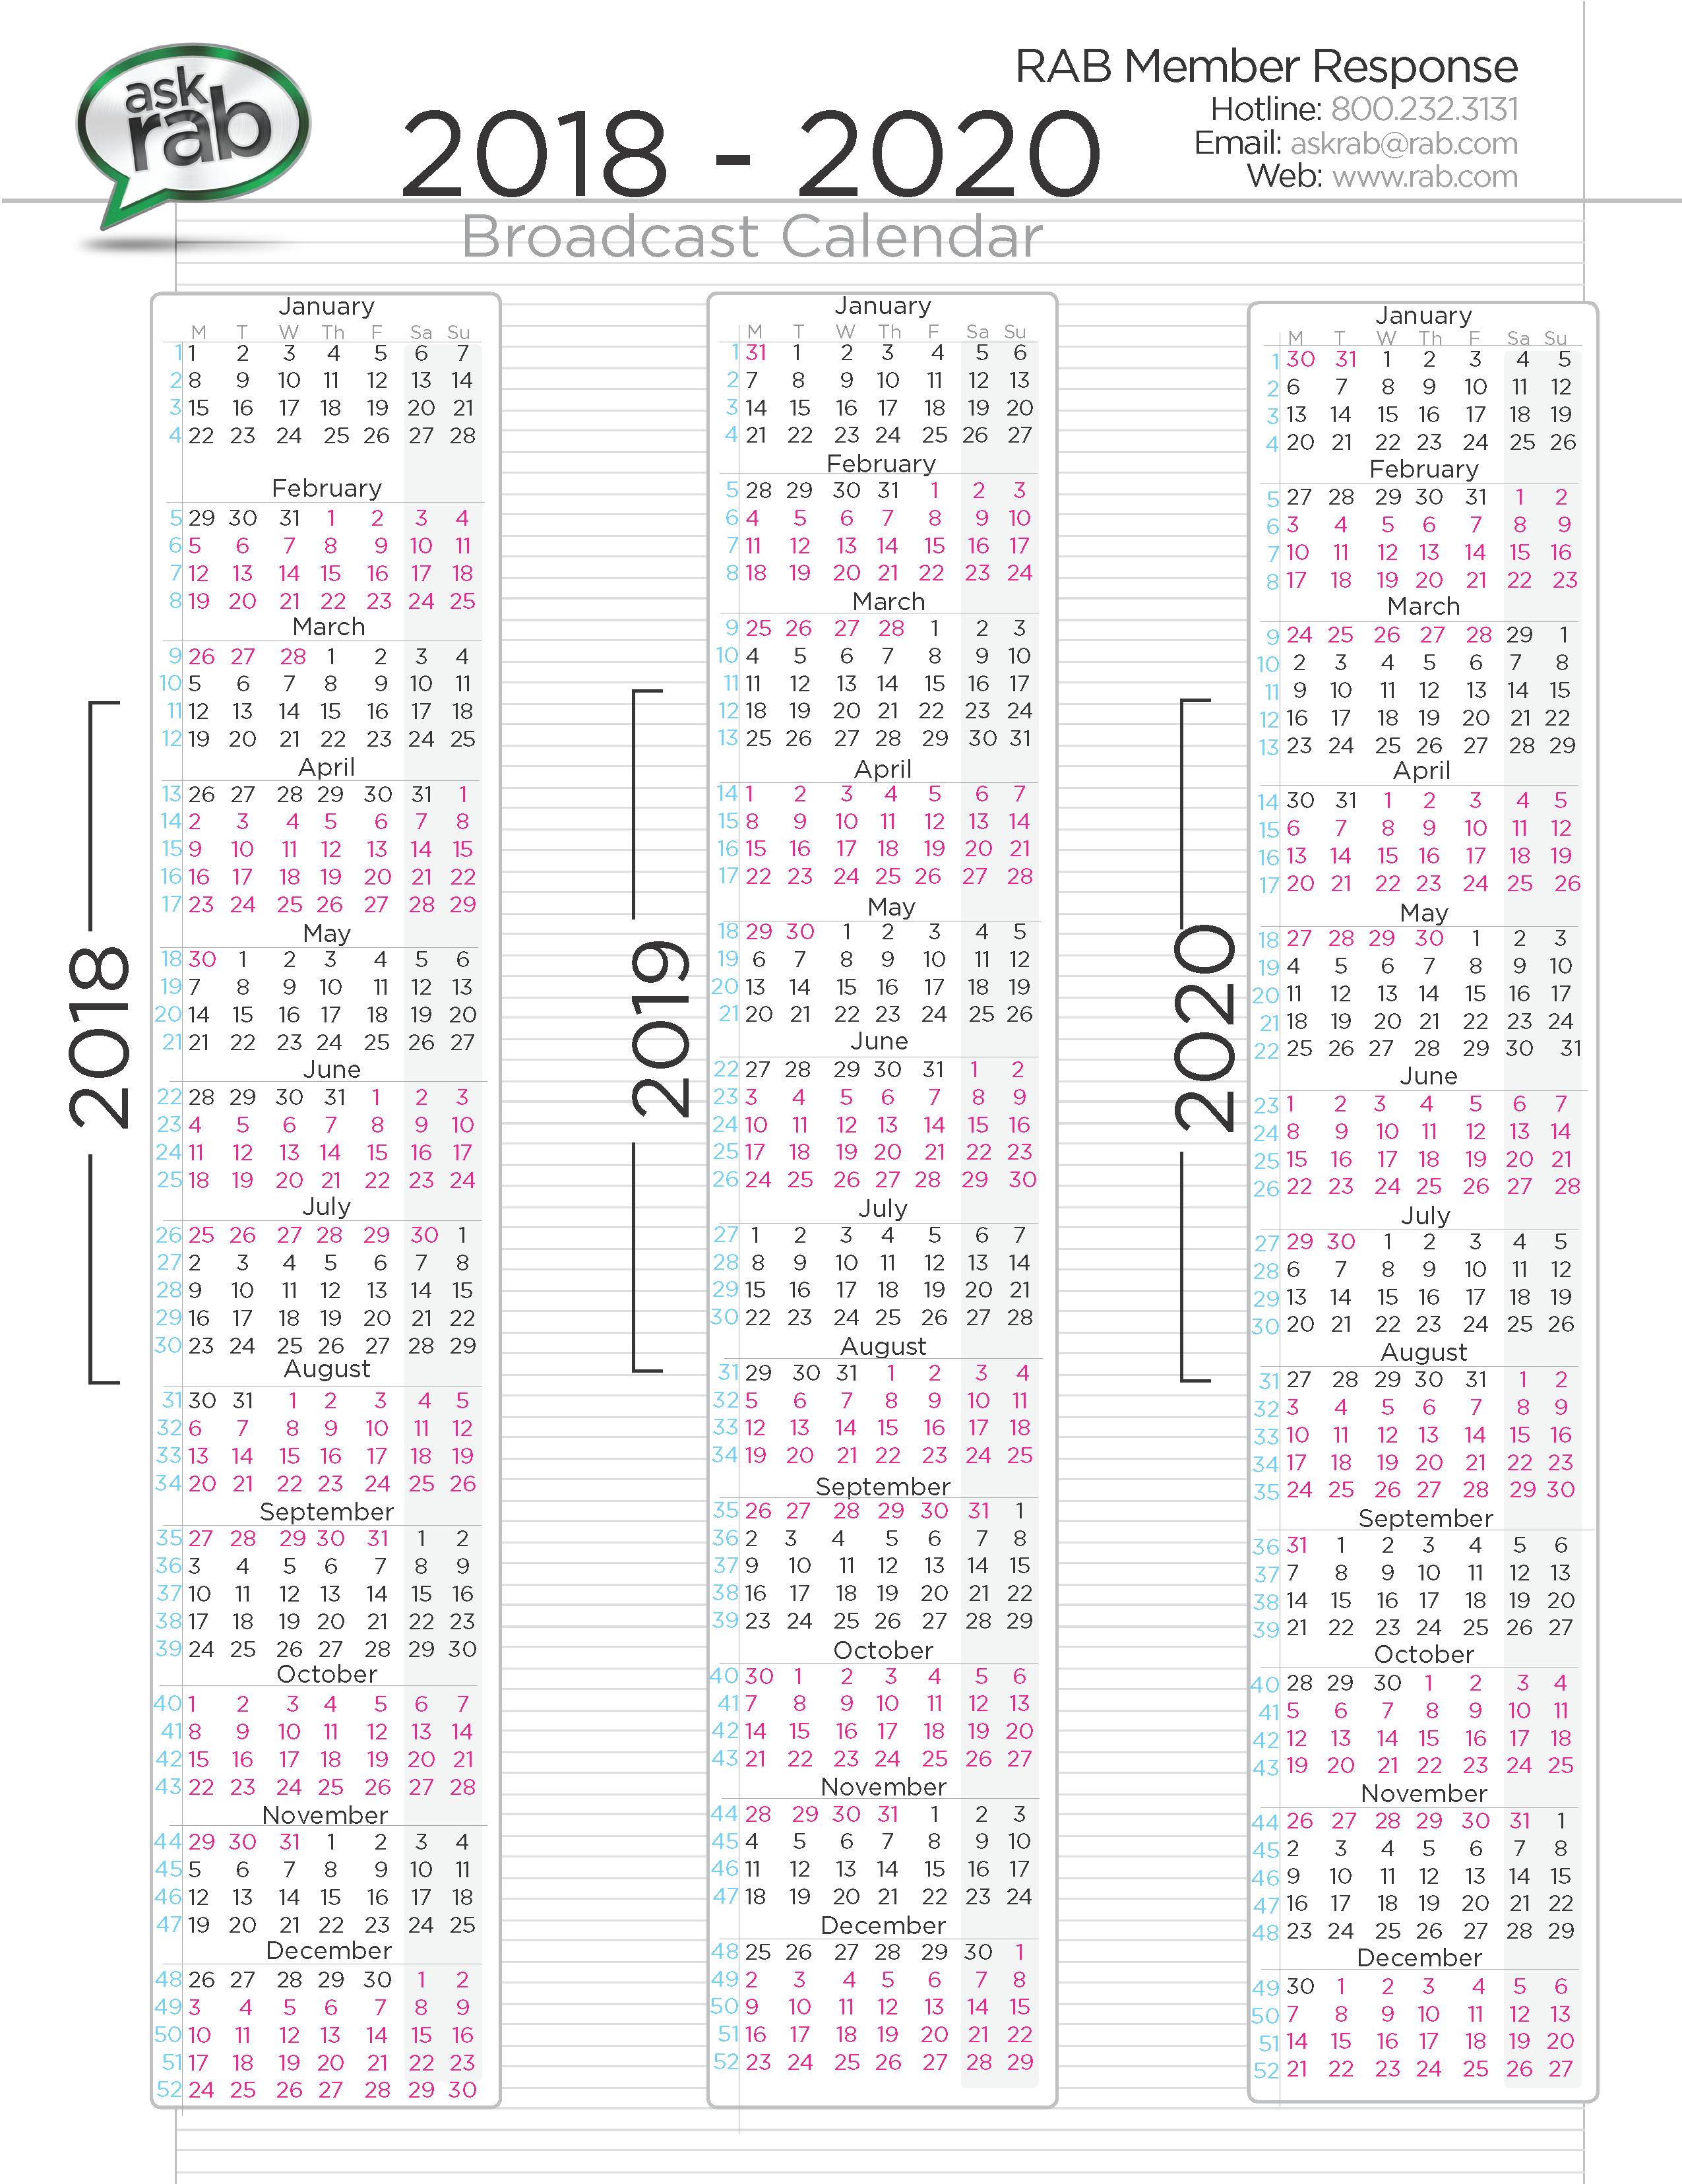 Broadcast Calendars | RAB.com